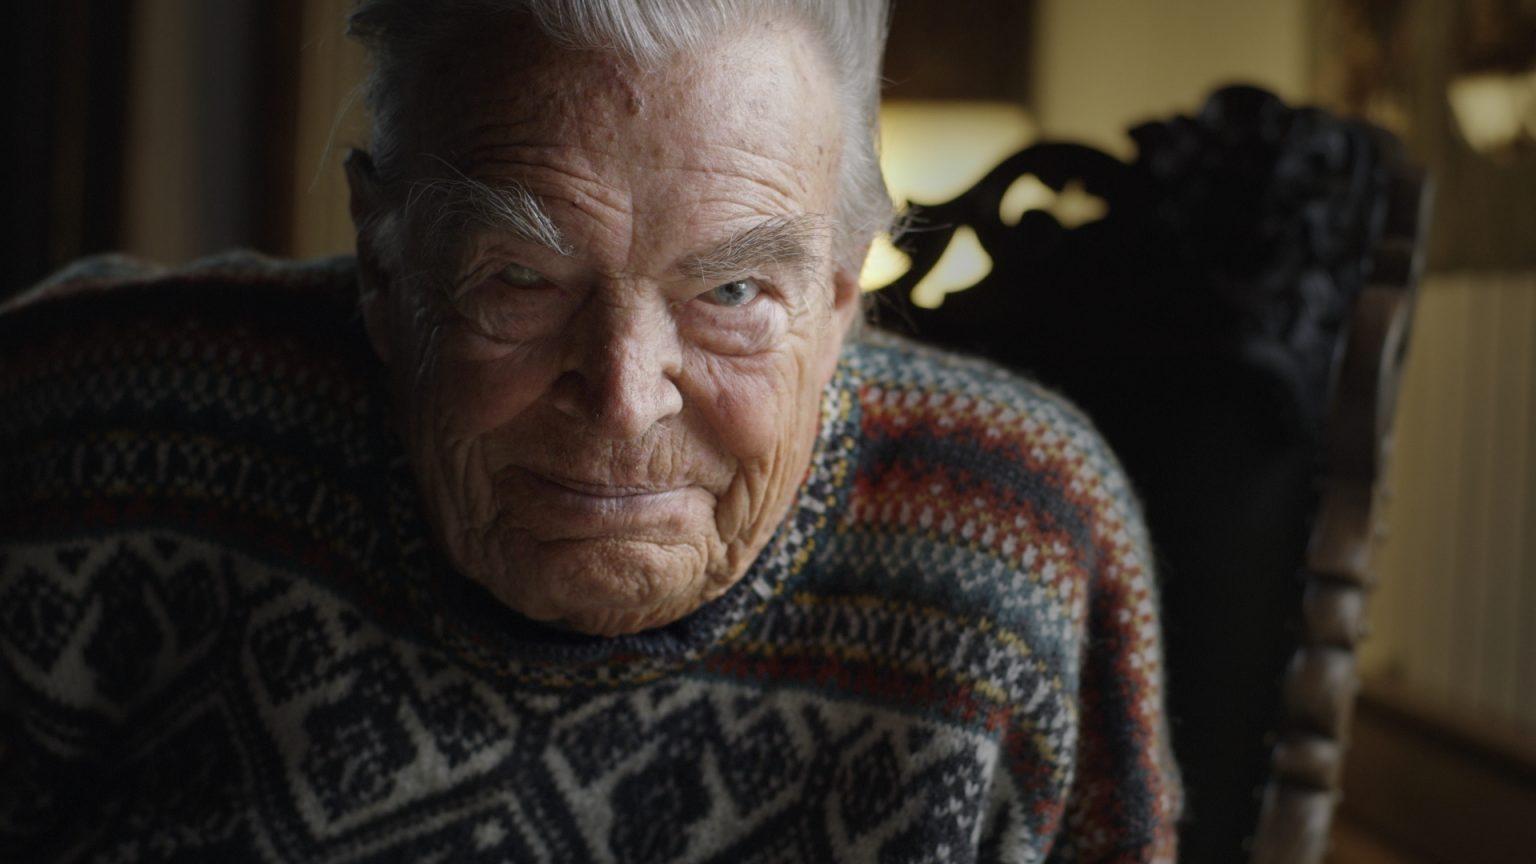 Great Grandad. Credit: Lis Dyre